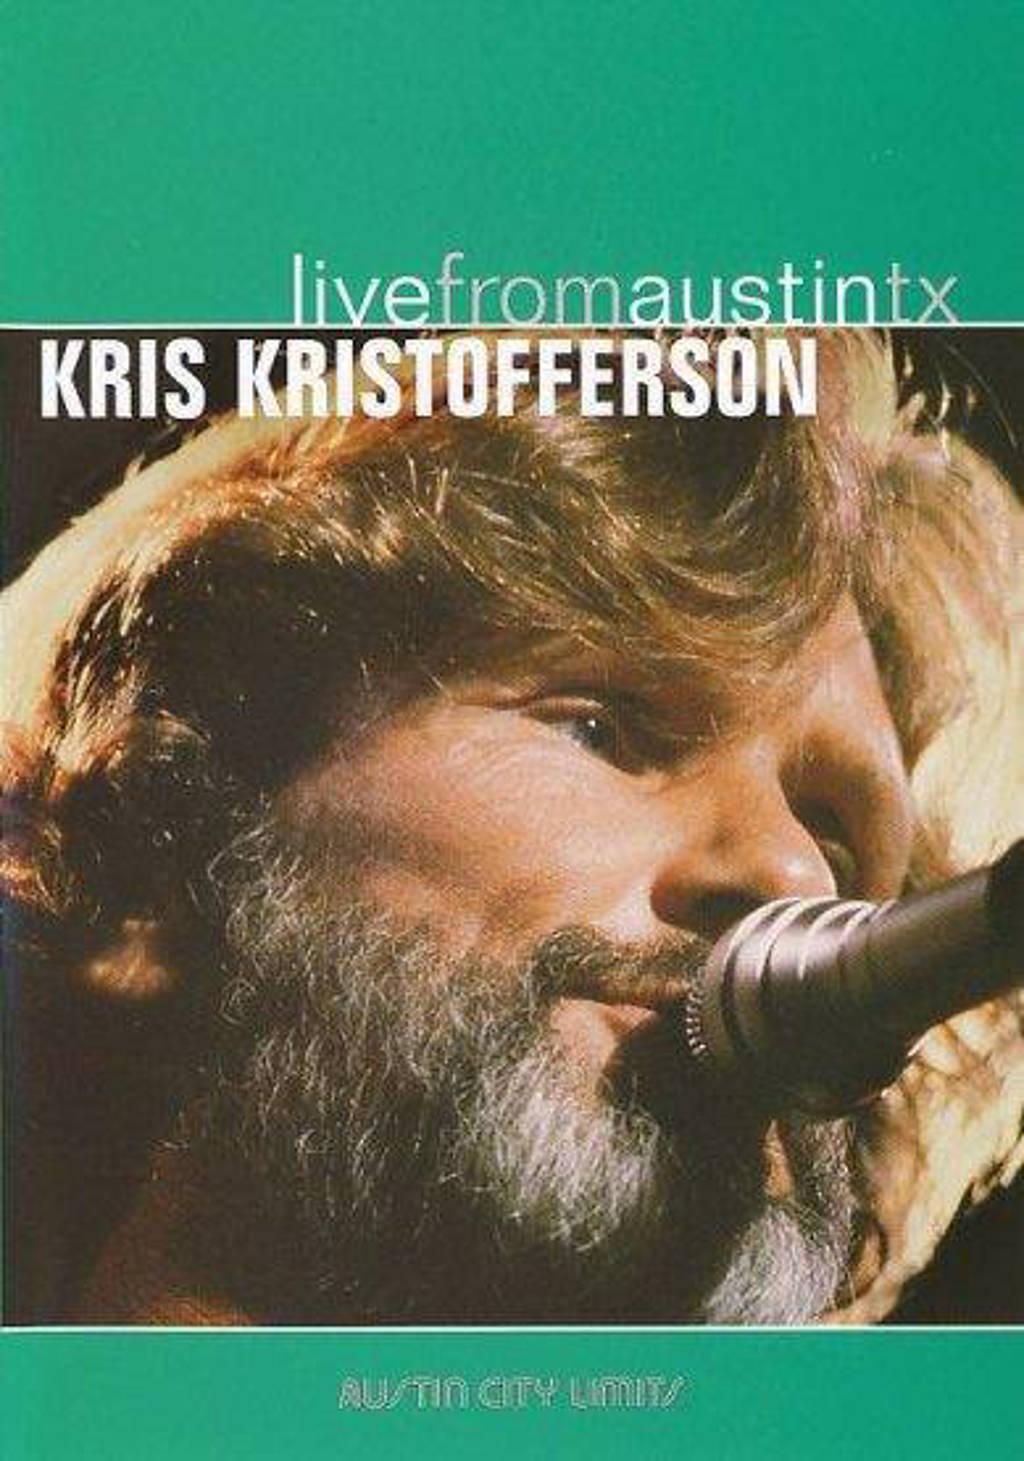 Kris Kristofferson - Live from Austin Texas (DVD)